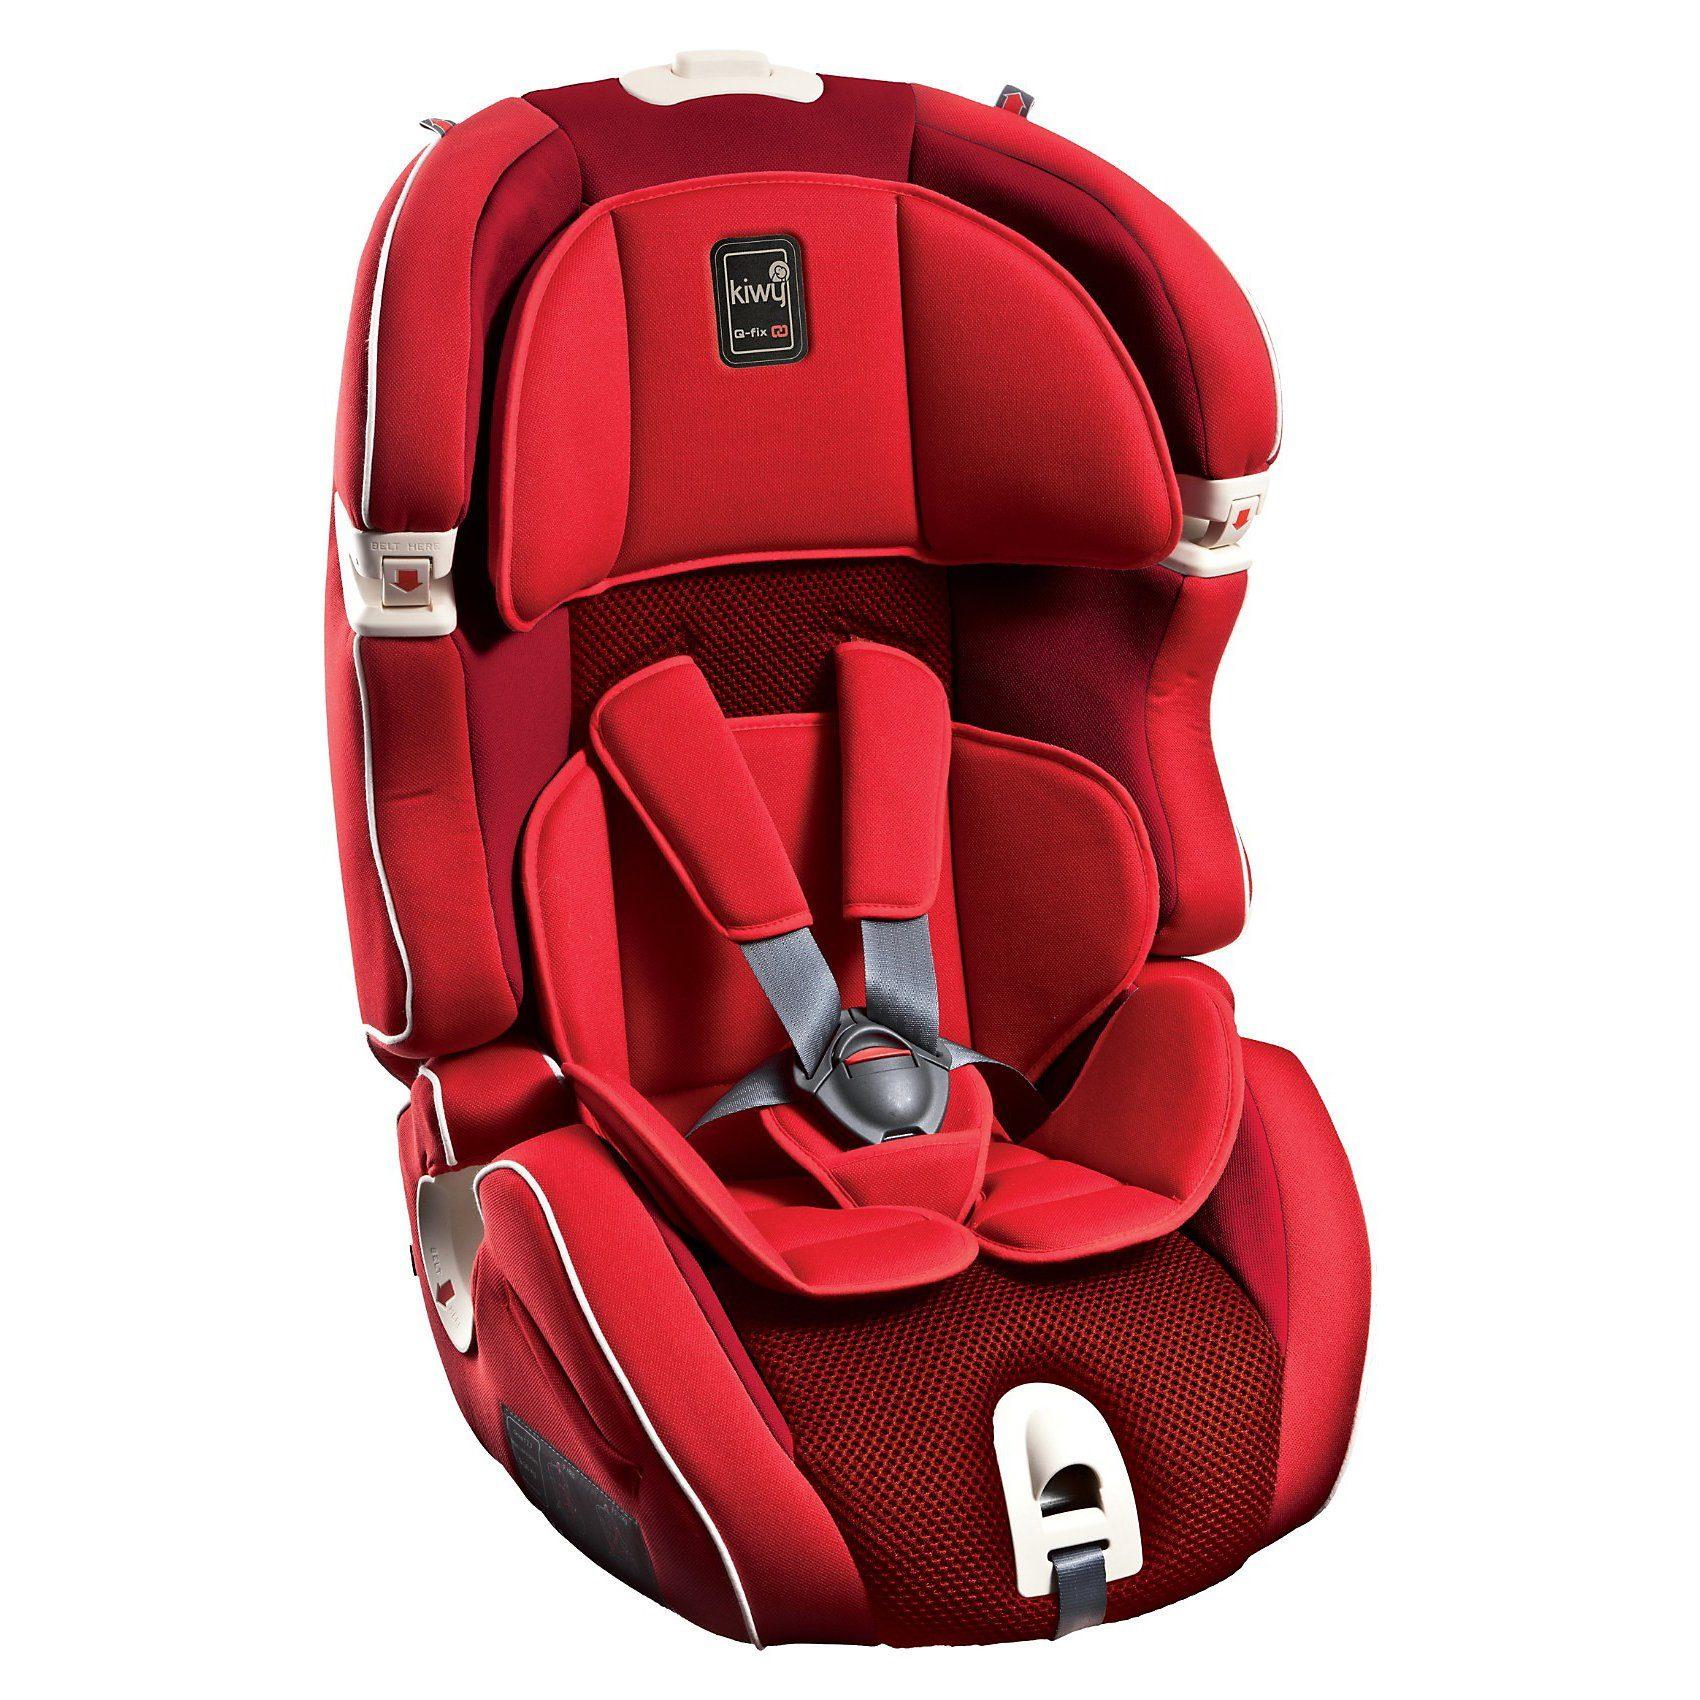 Kiwy Auto-Kindersitz SLF123 Q-Fix, Cherry, 2017